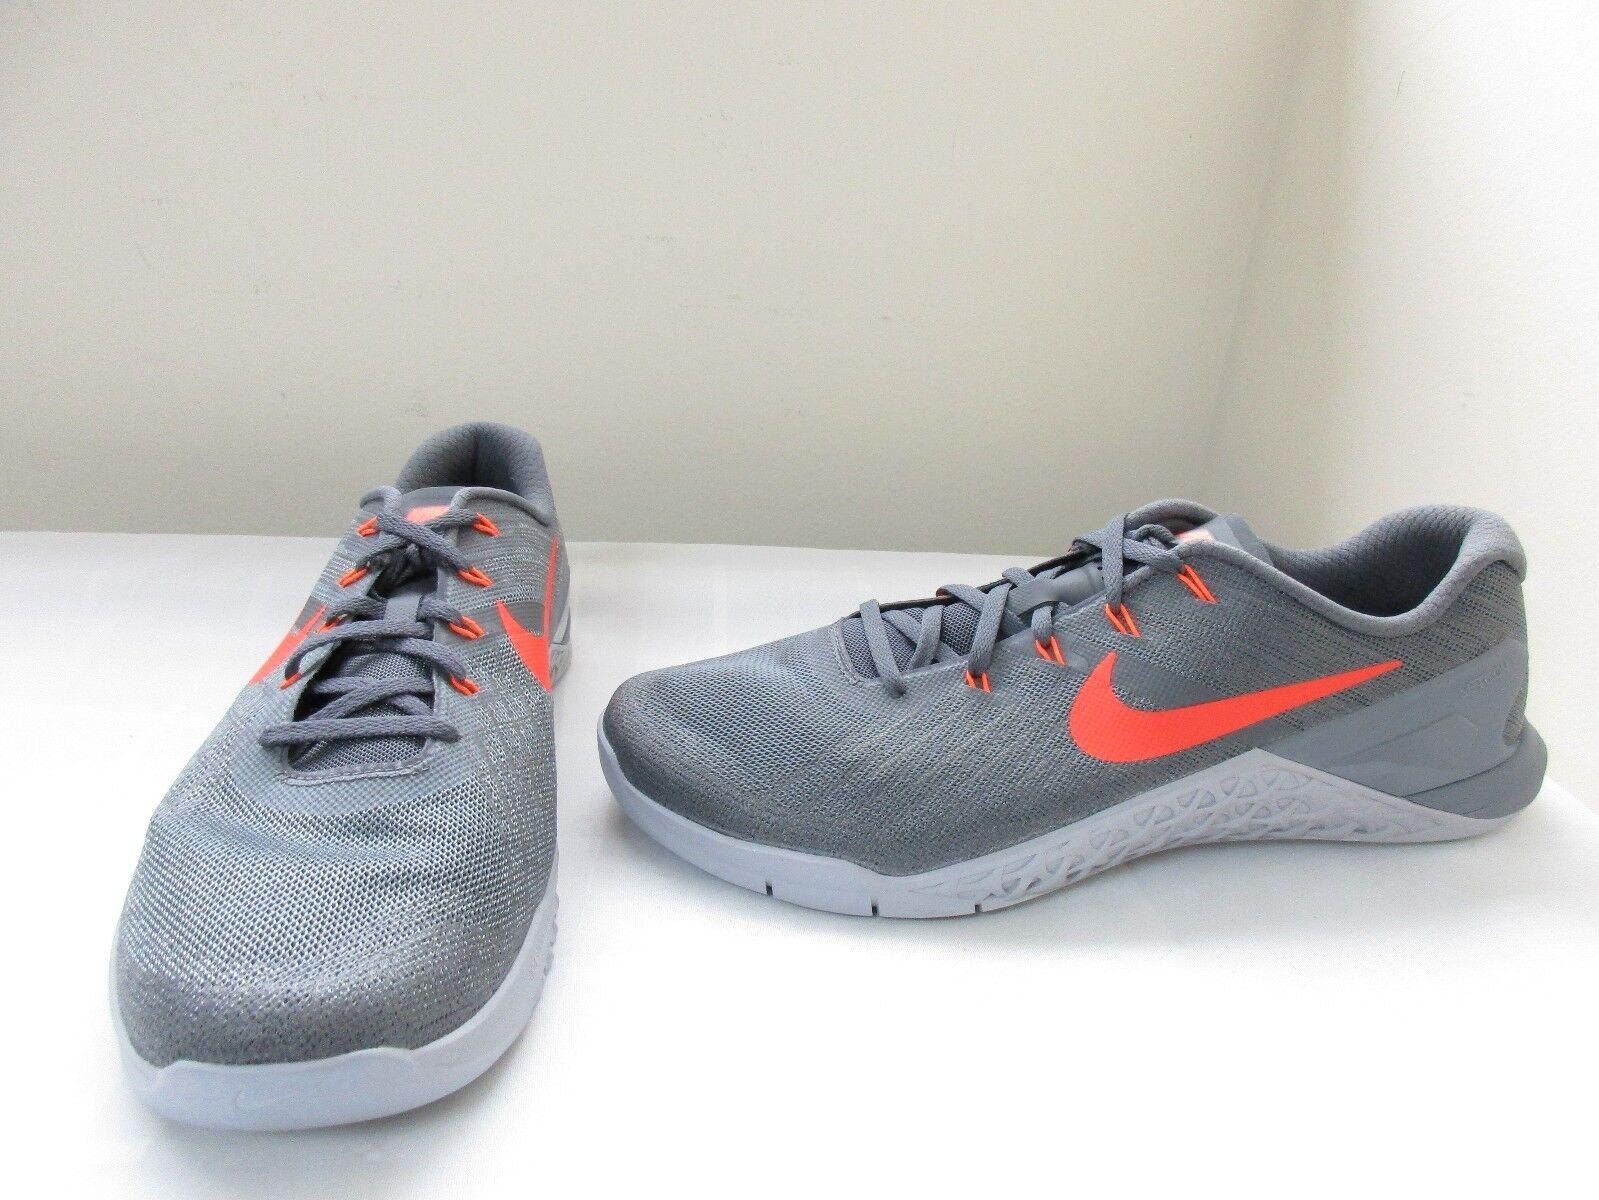 New  Men's Nike Metcon 3 Athletic Training Shoe 852928-007 Gray/Orange dc 1Q